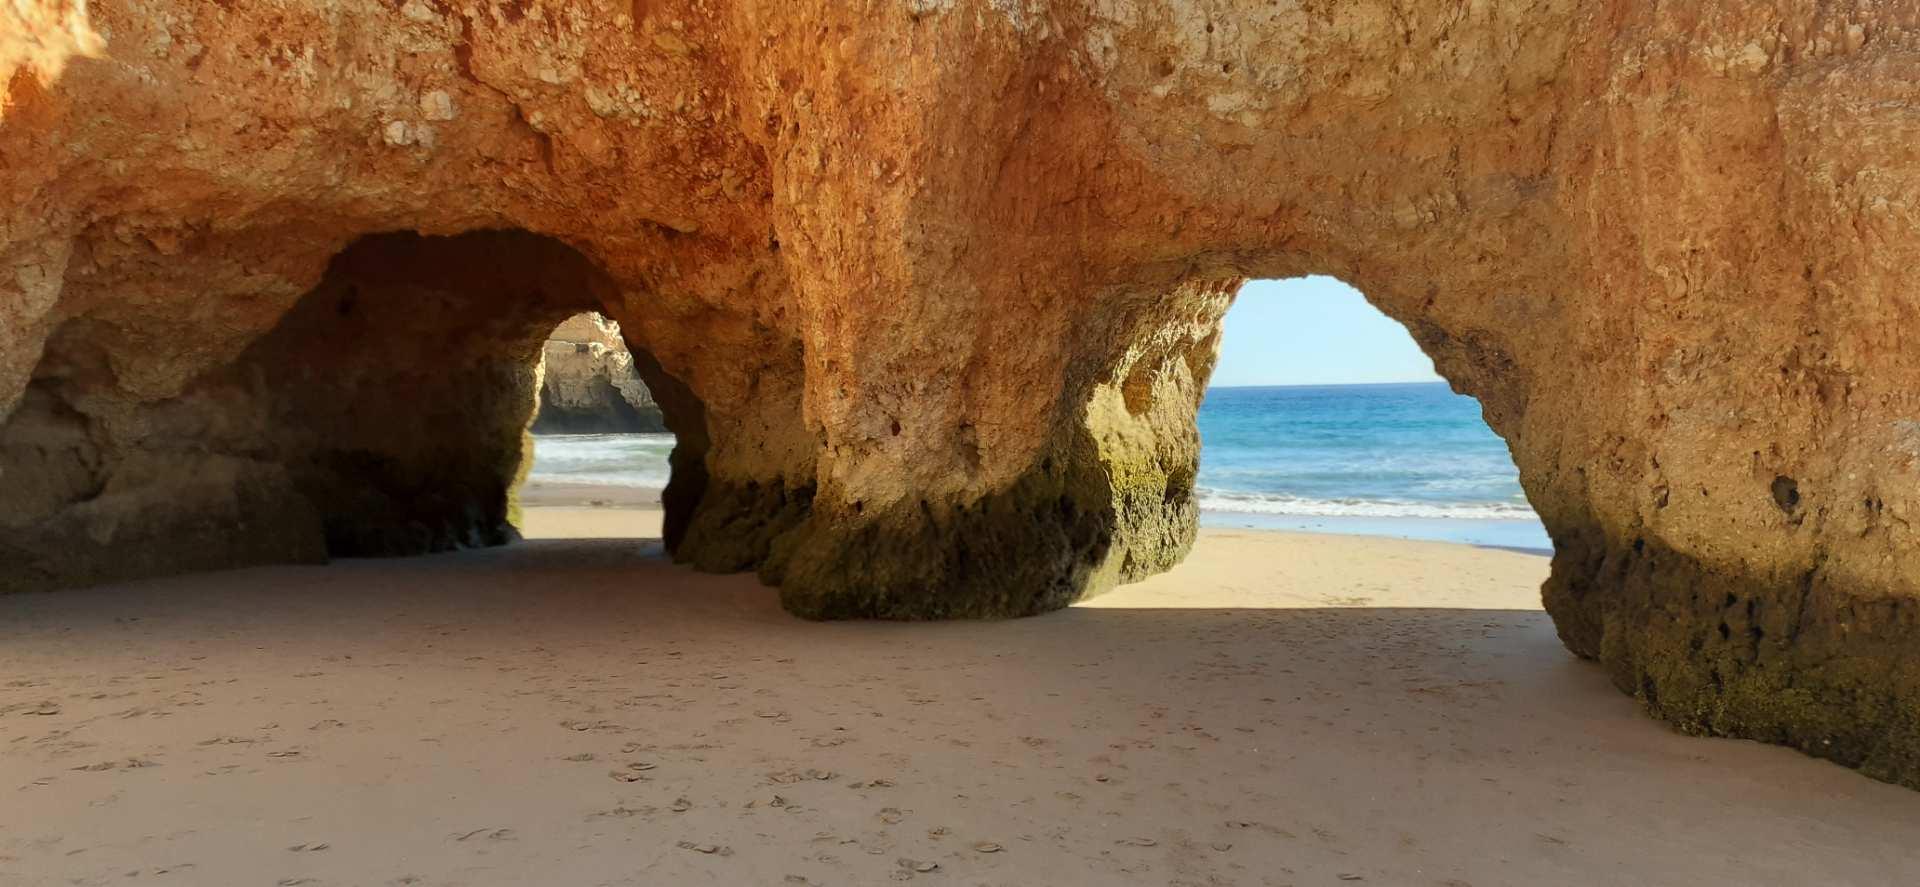 Praia dos Três Irmaos